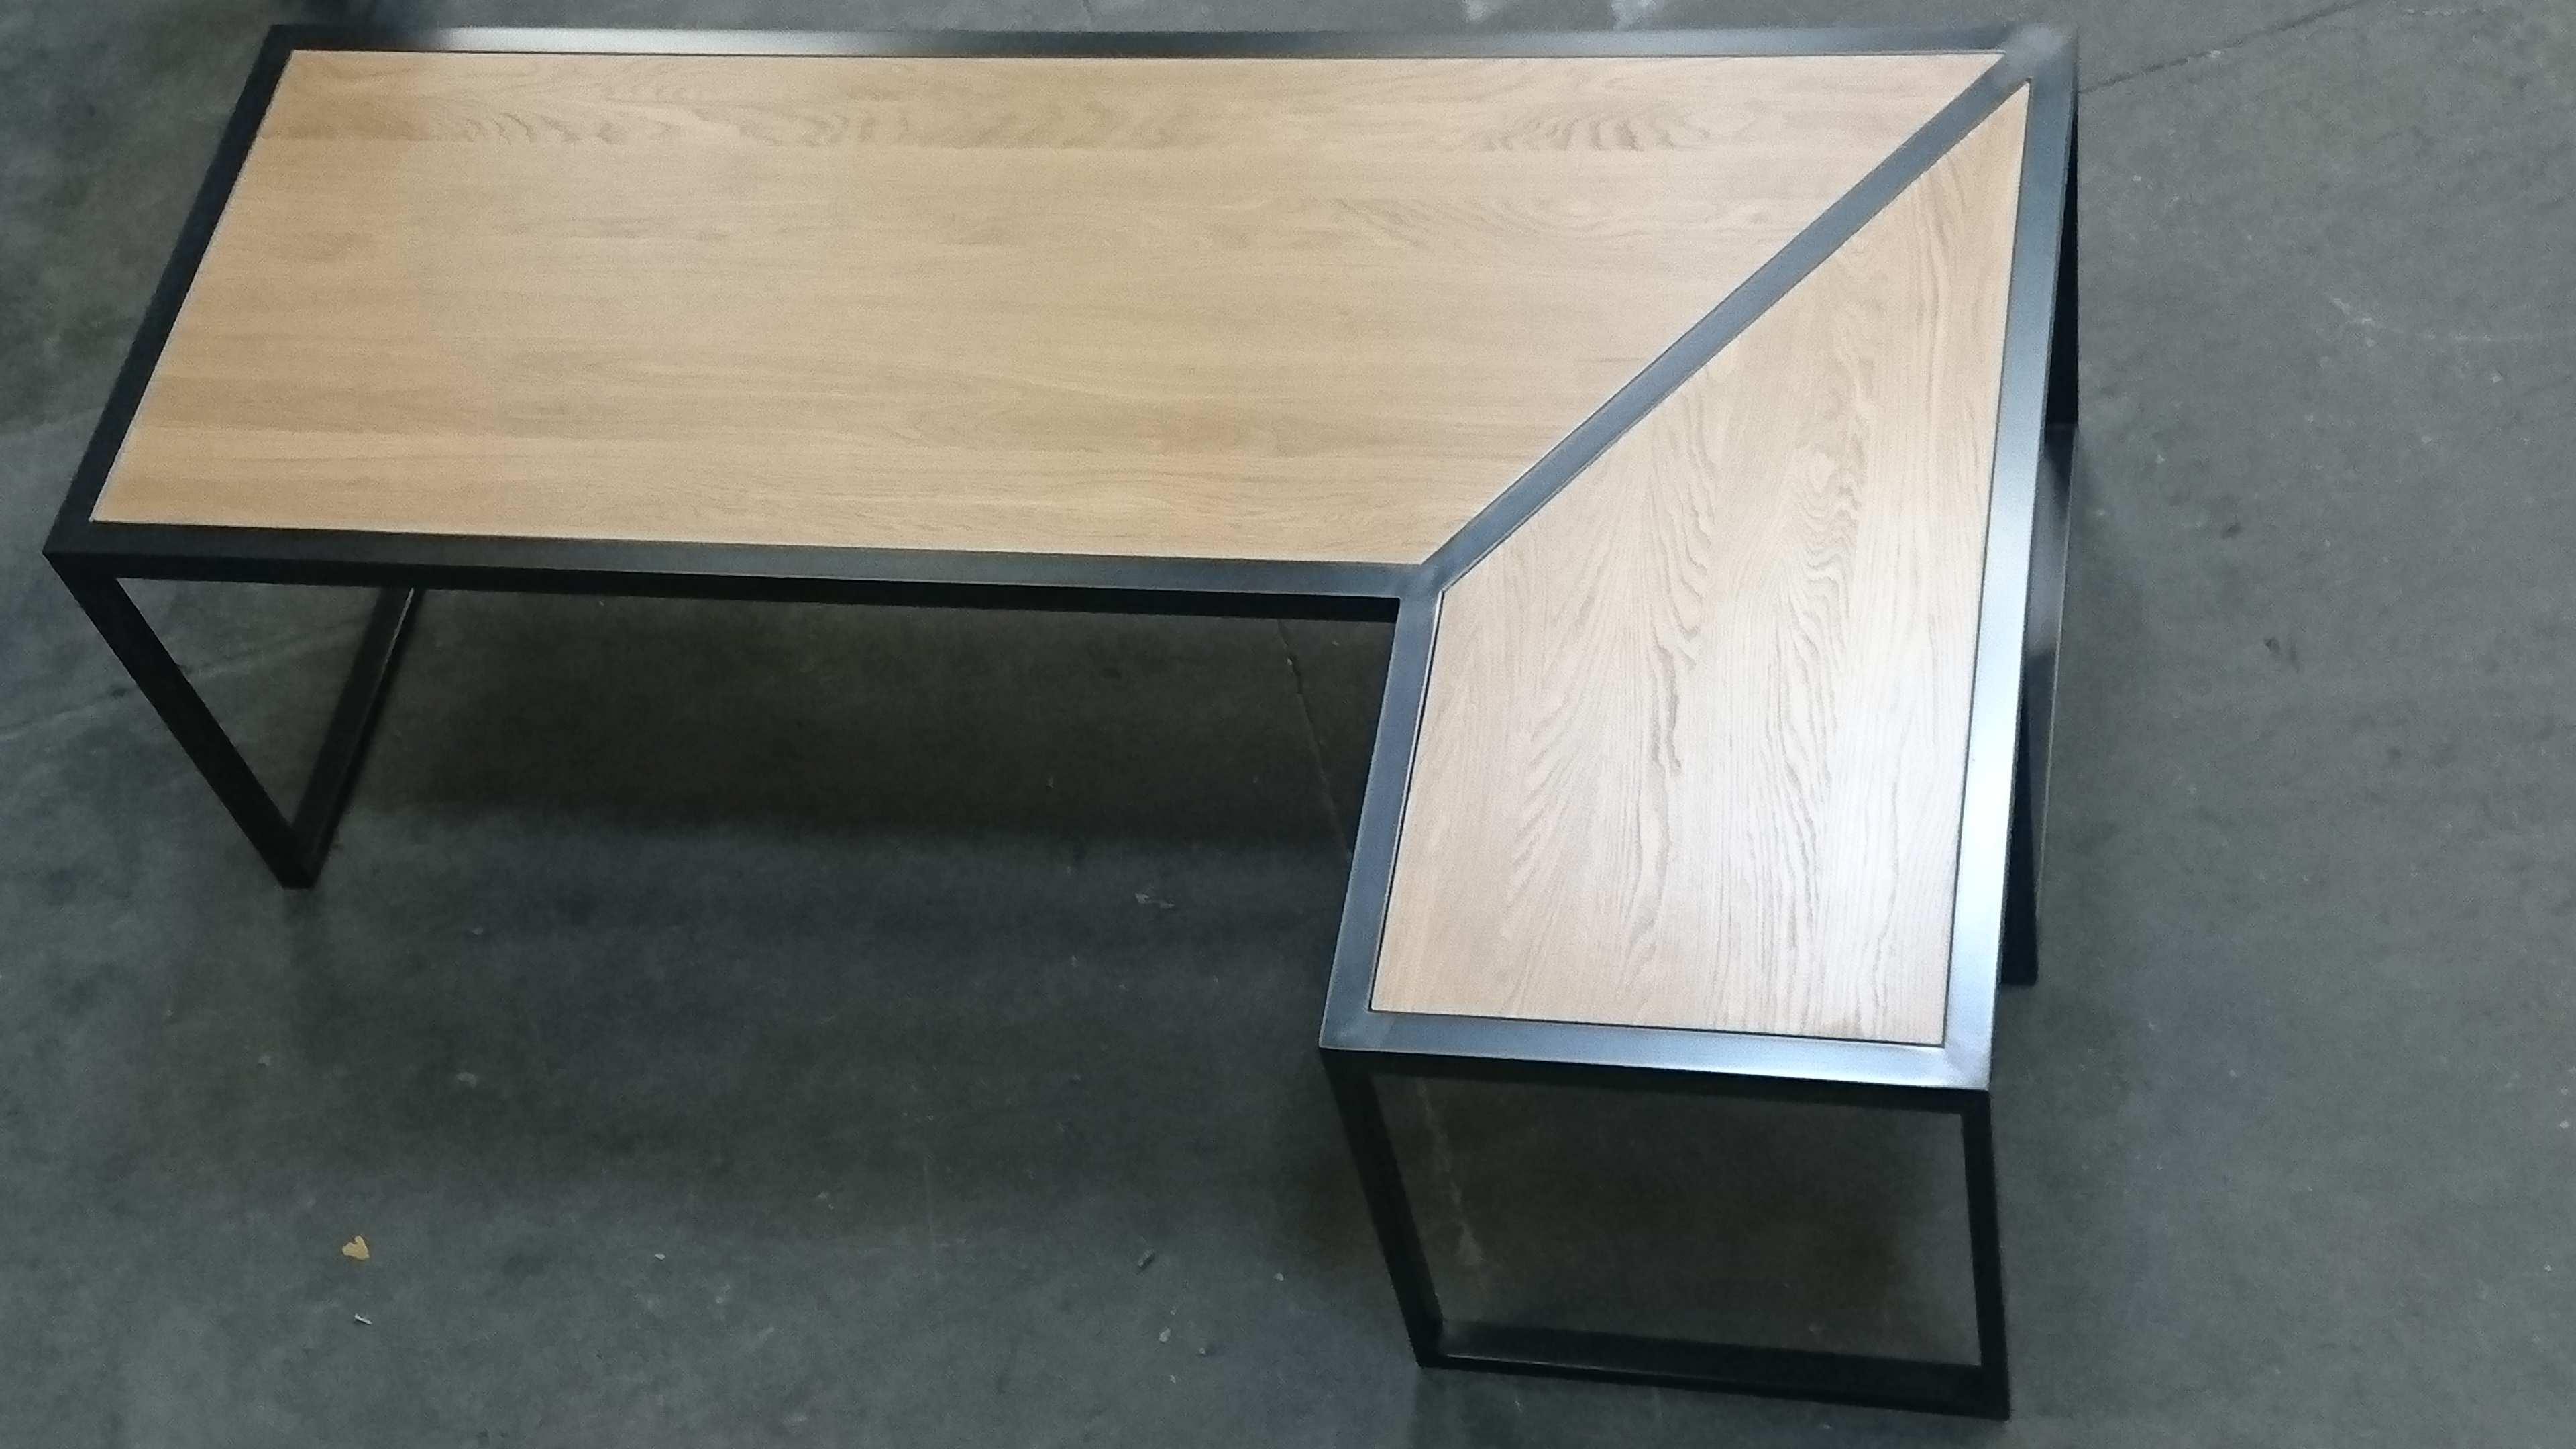 mobilier métallique design